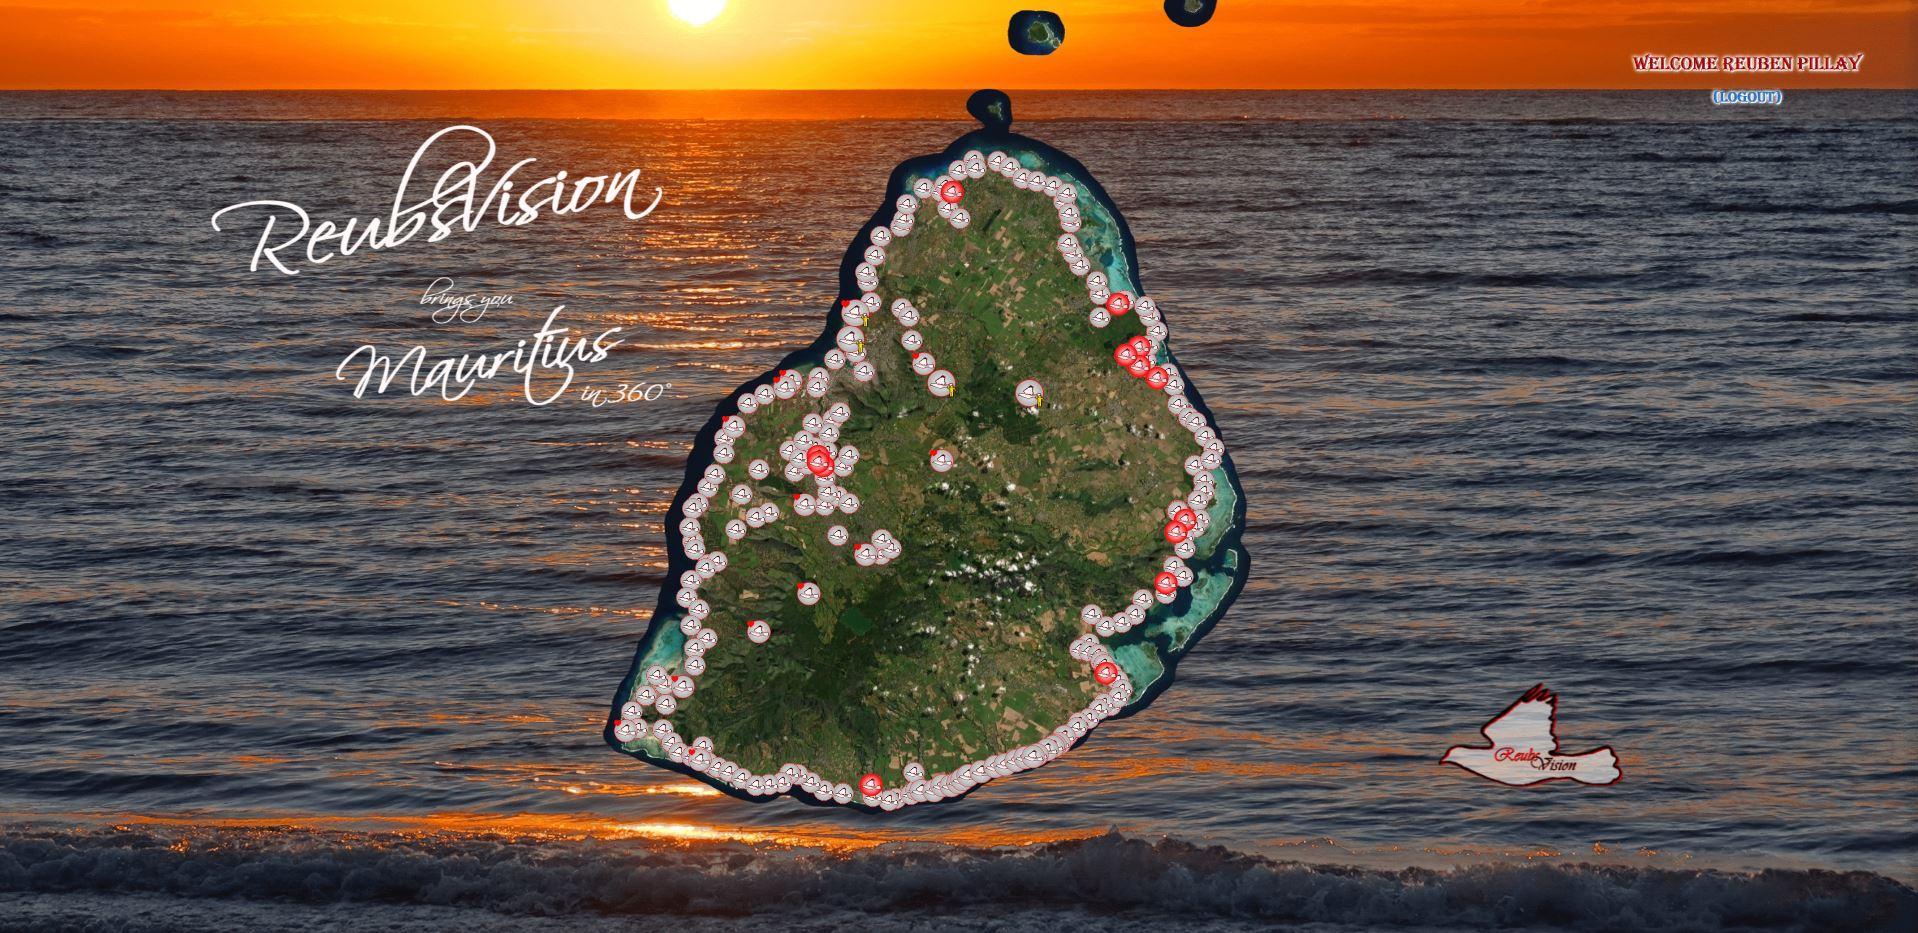 2020-06-27 18_23_20-ReubsVision – Mauritius 360 – Firefox Developer Edition